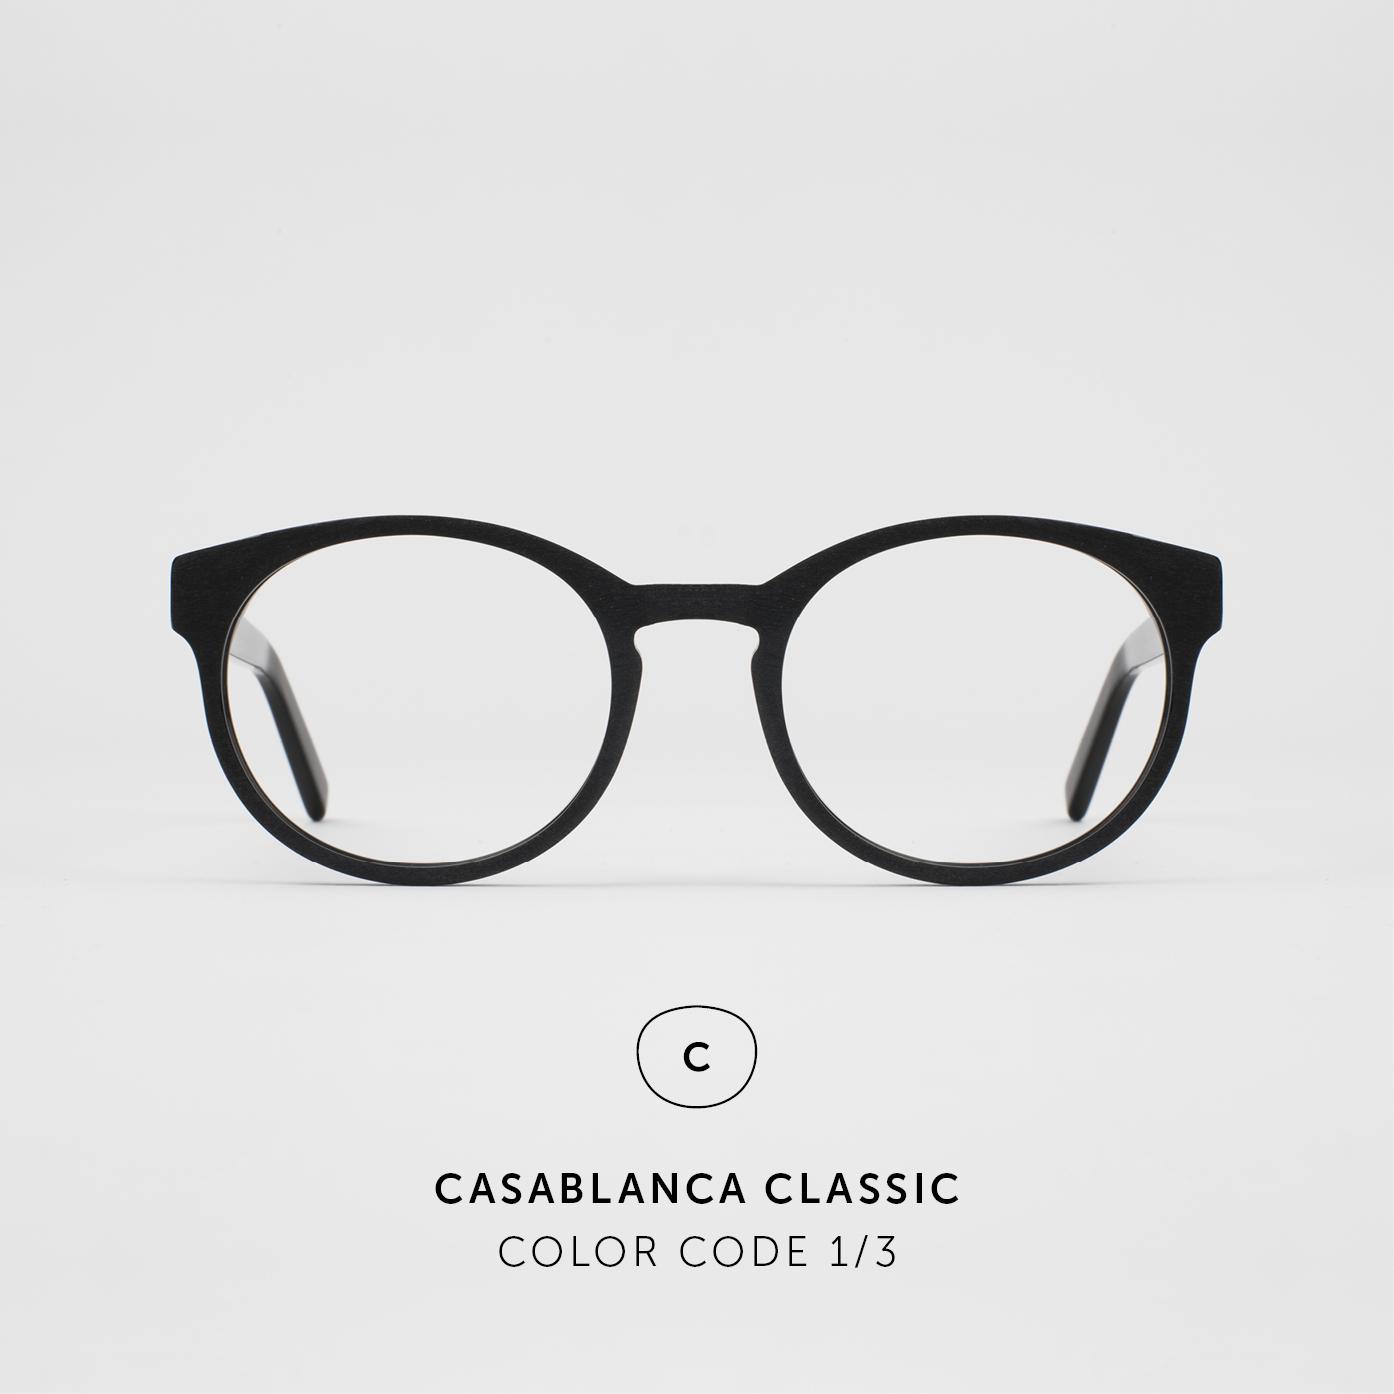 CasablancaClassic9.jpg